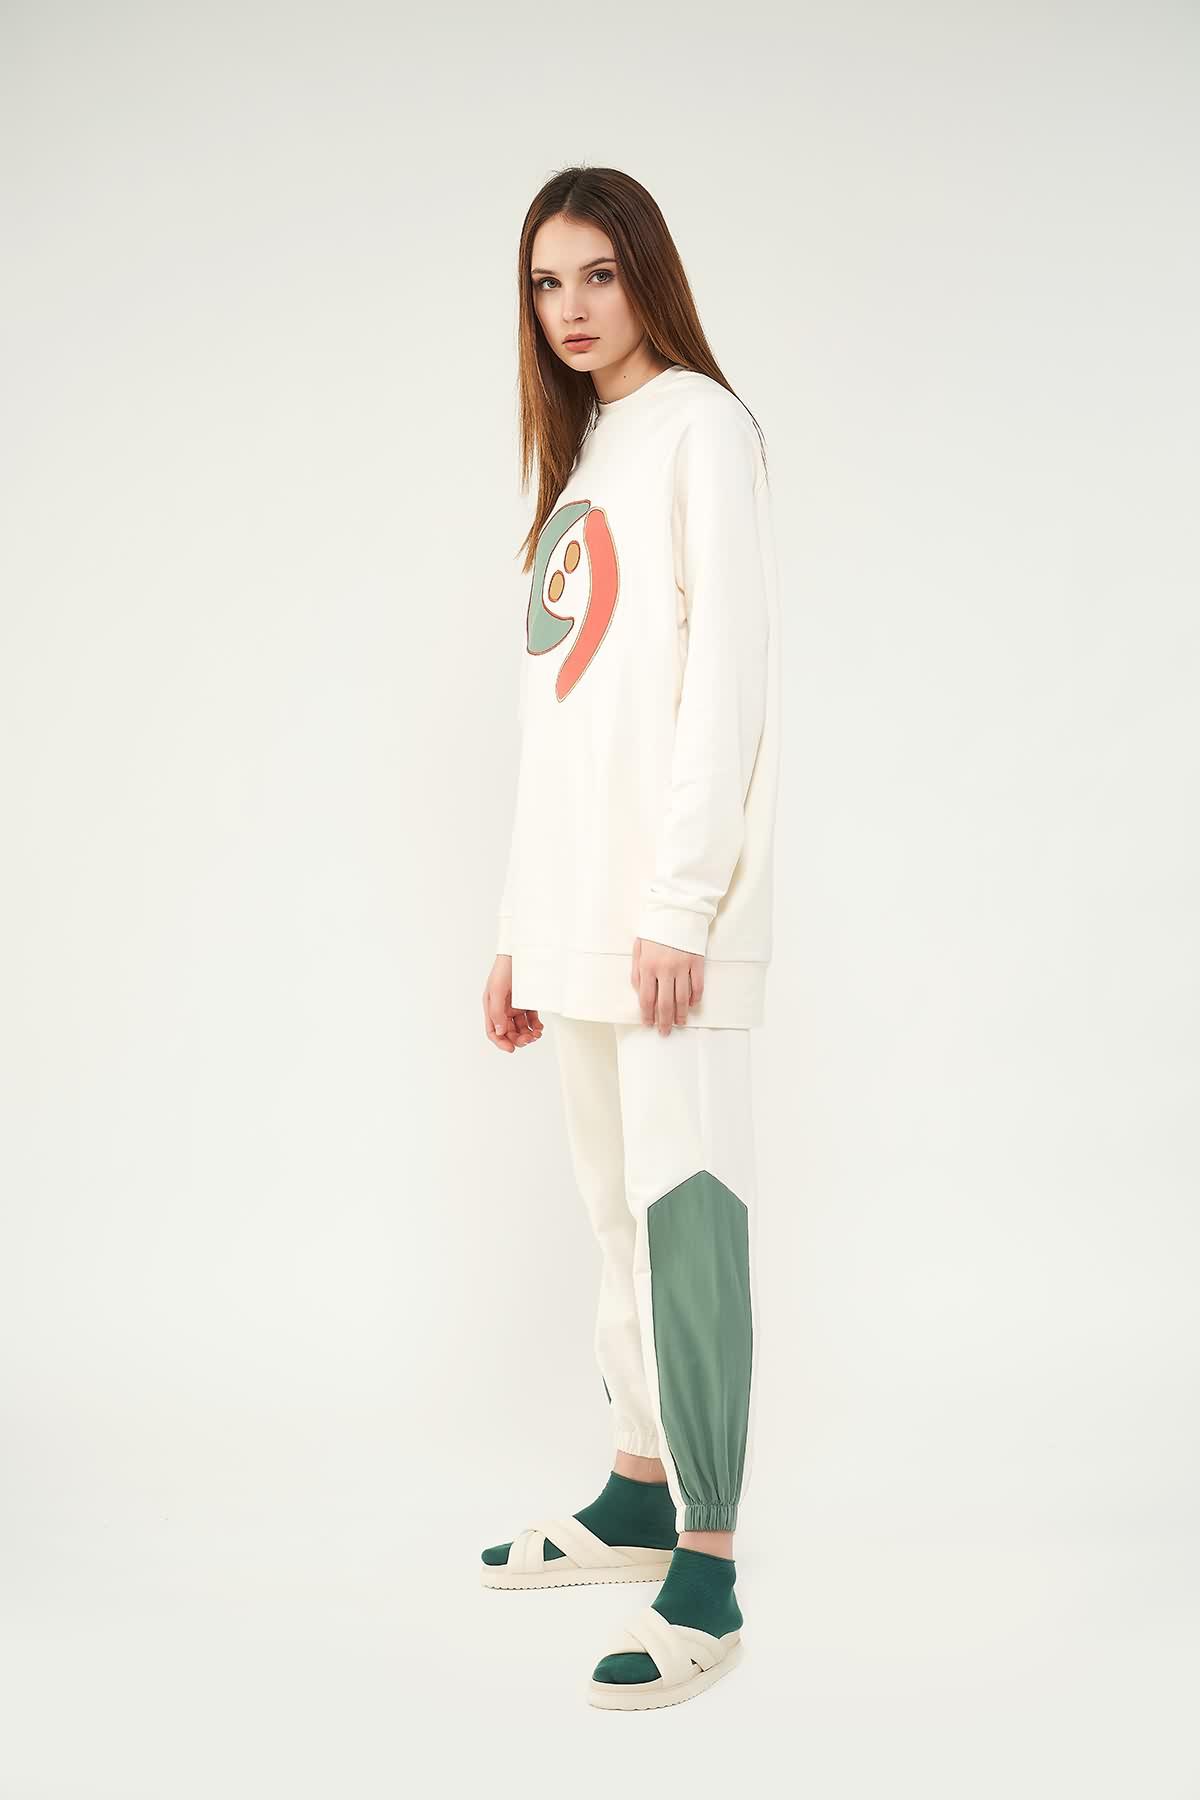 Nakışlı Sweatshirt N2 Yeşil - Thumbnail